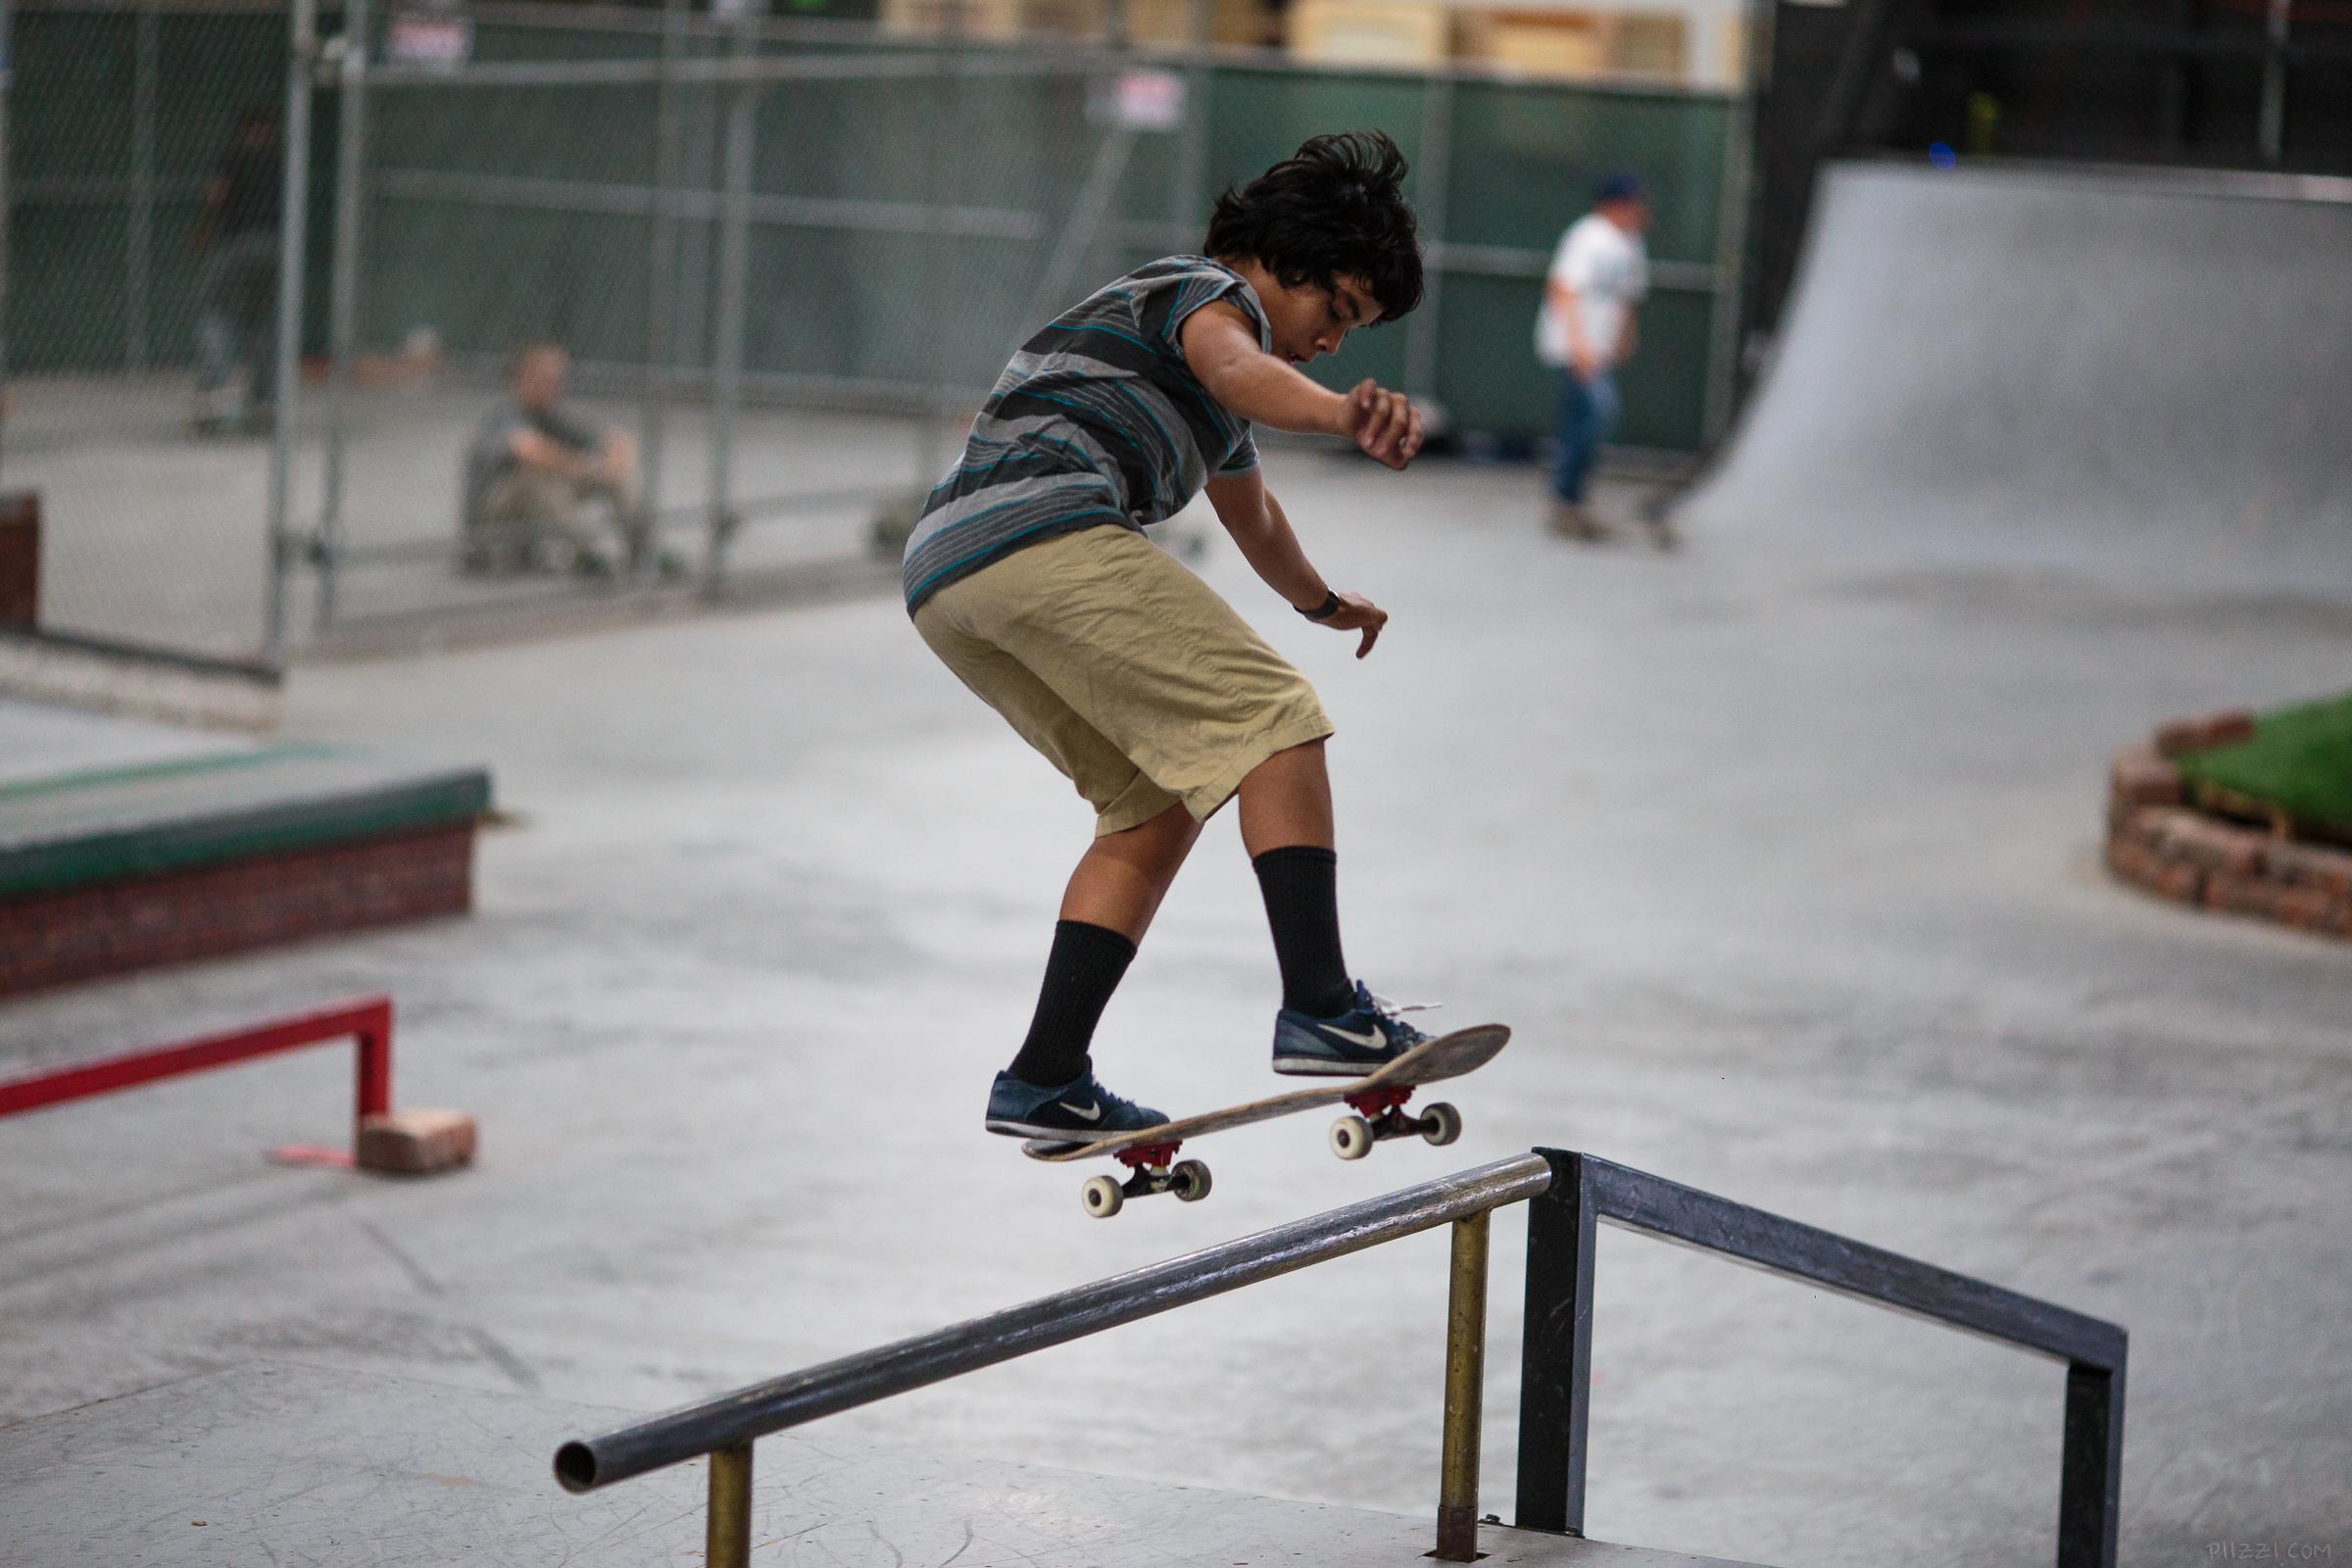 skate_rail_fsboard_alberto.jpg